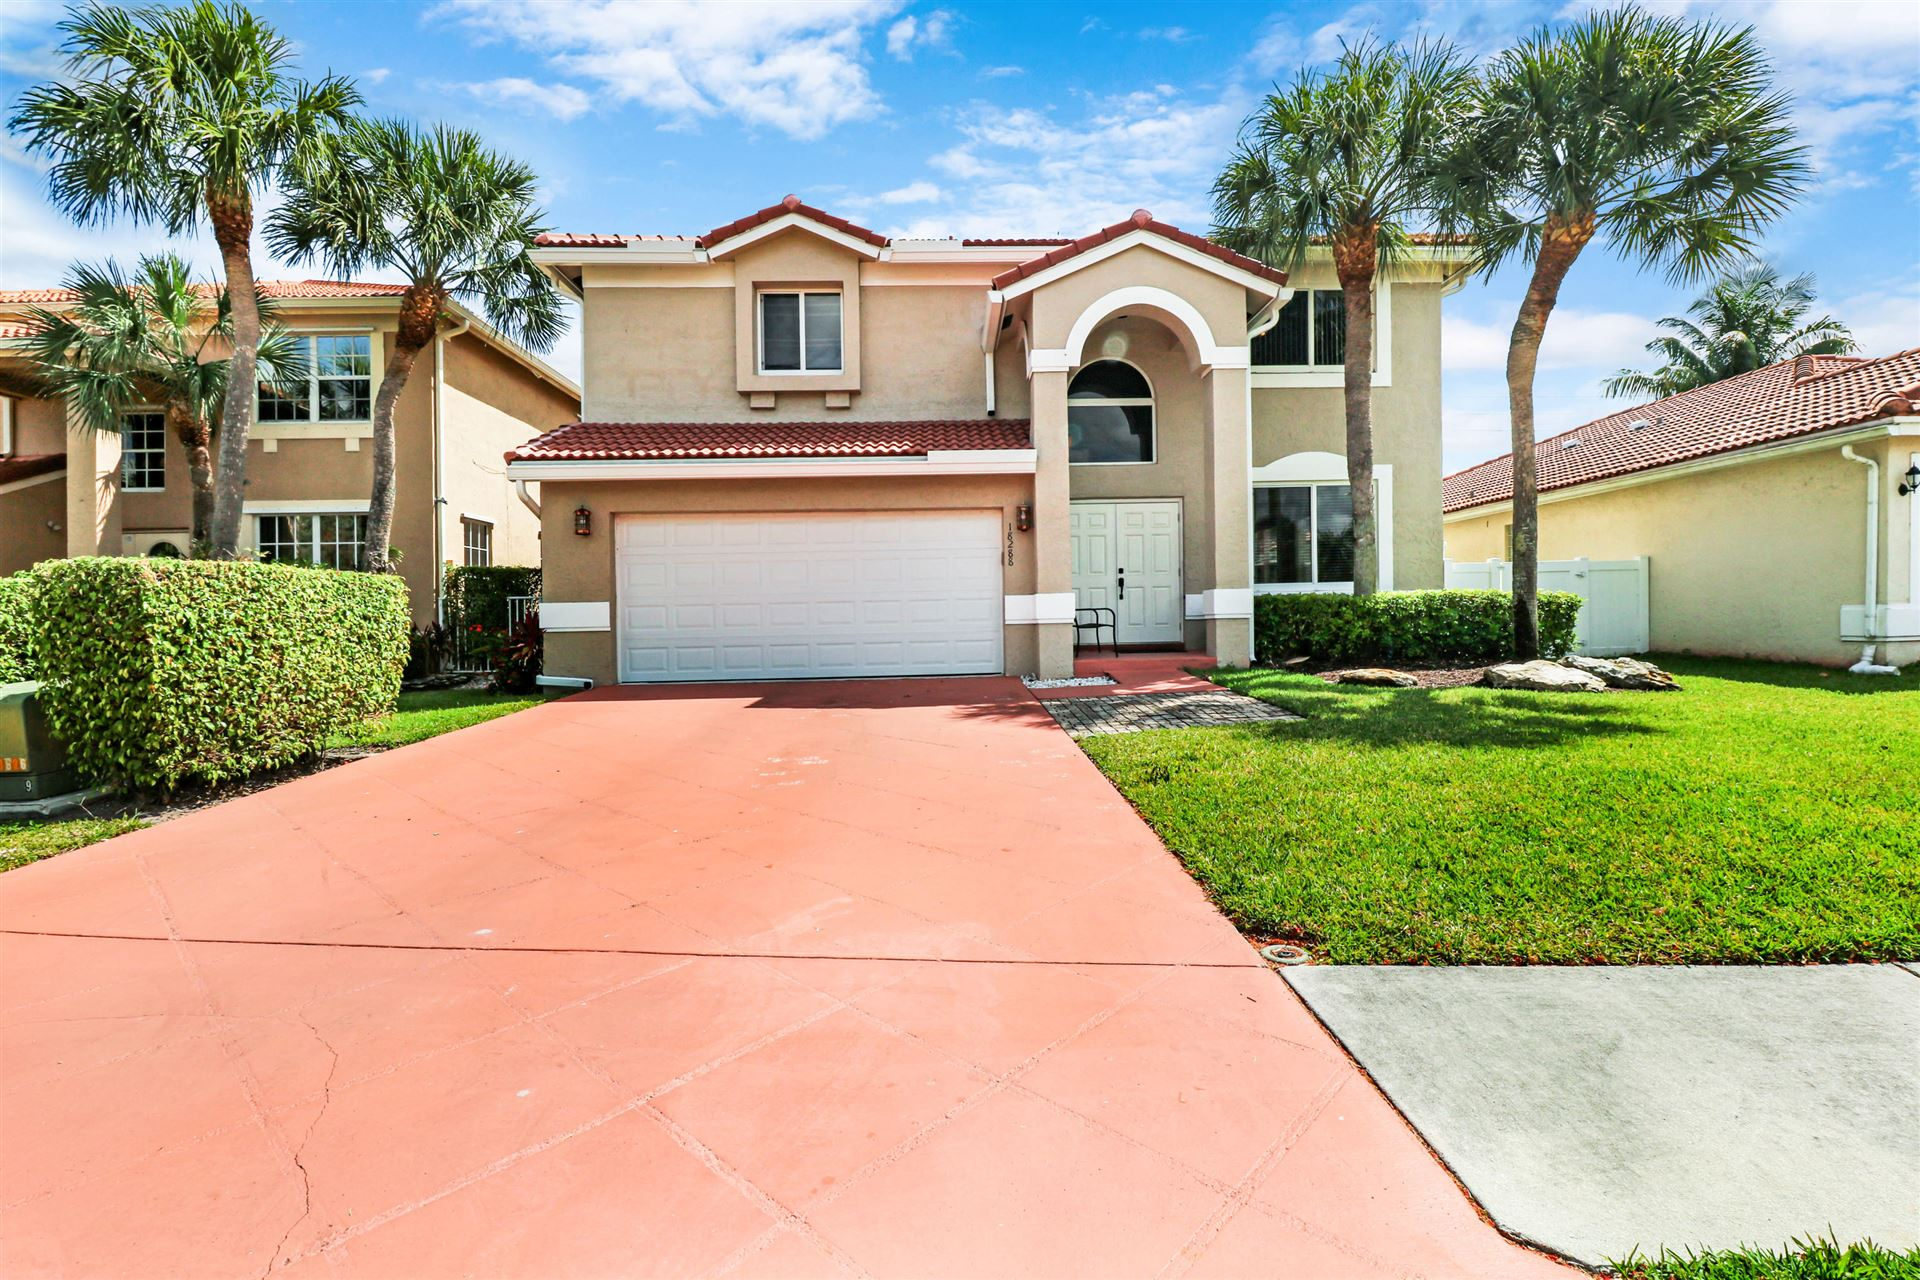 18288 Coral Isles Drive, Boca Raton, FL 33498 - #: RX-10706905